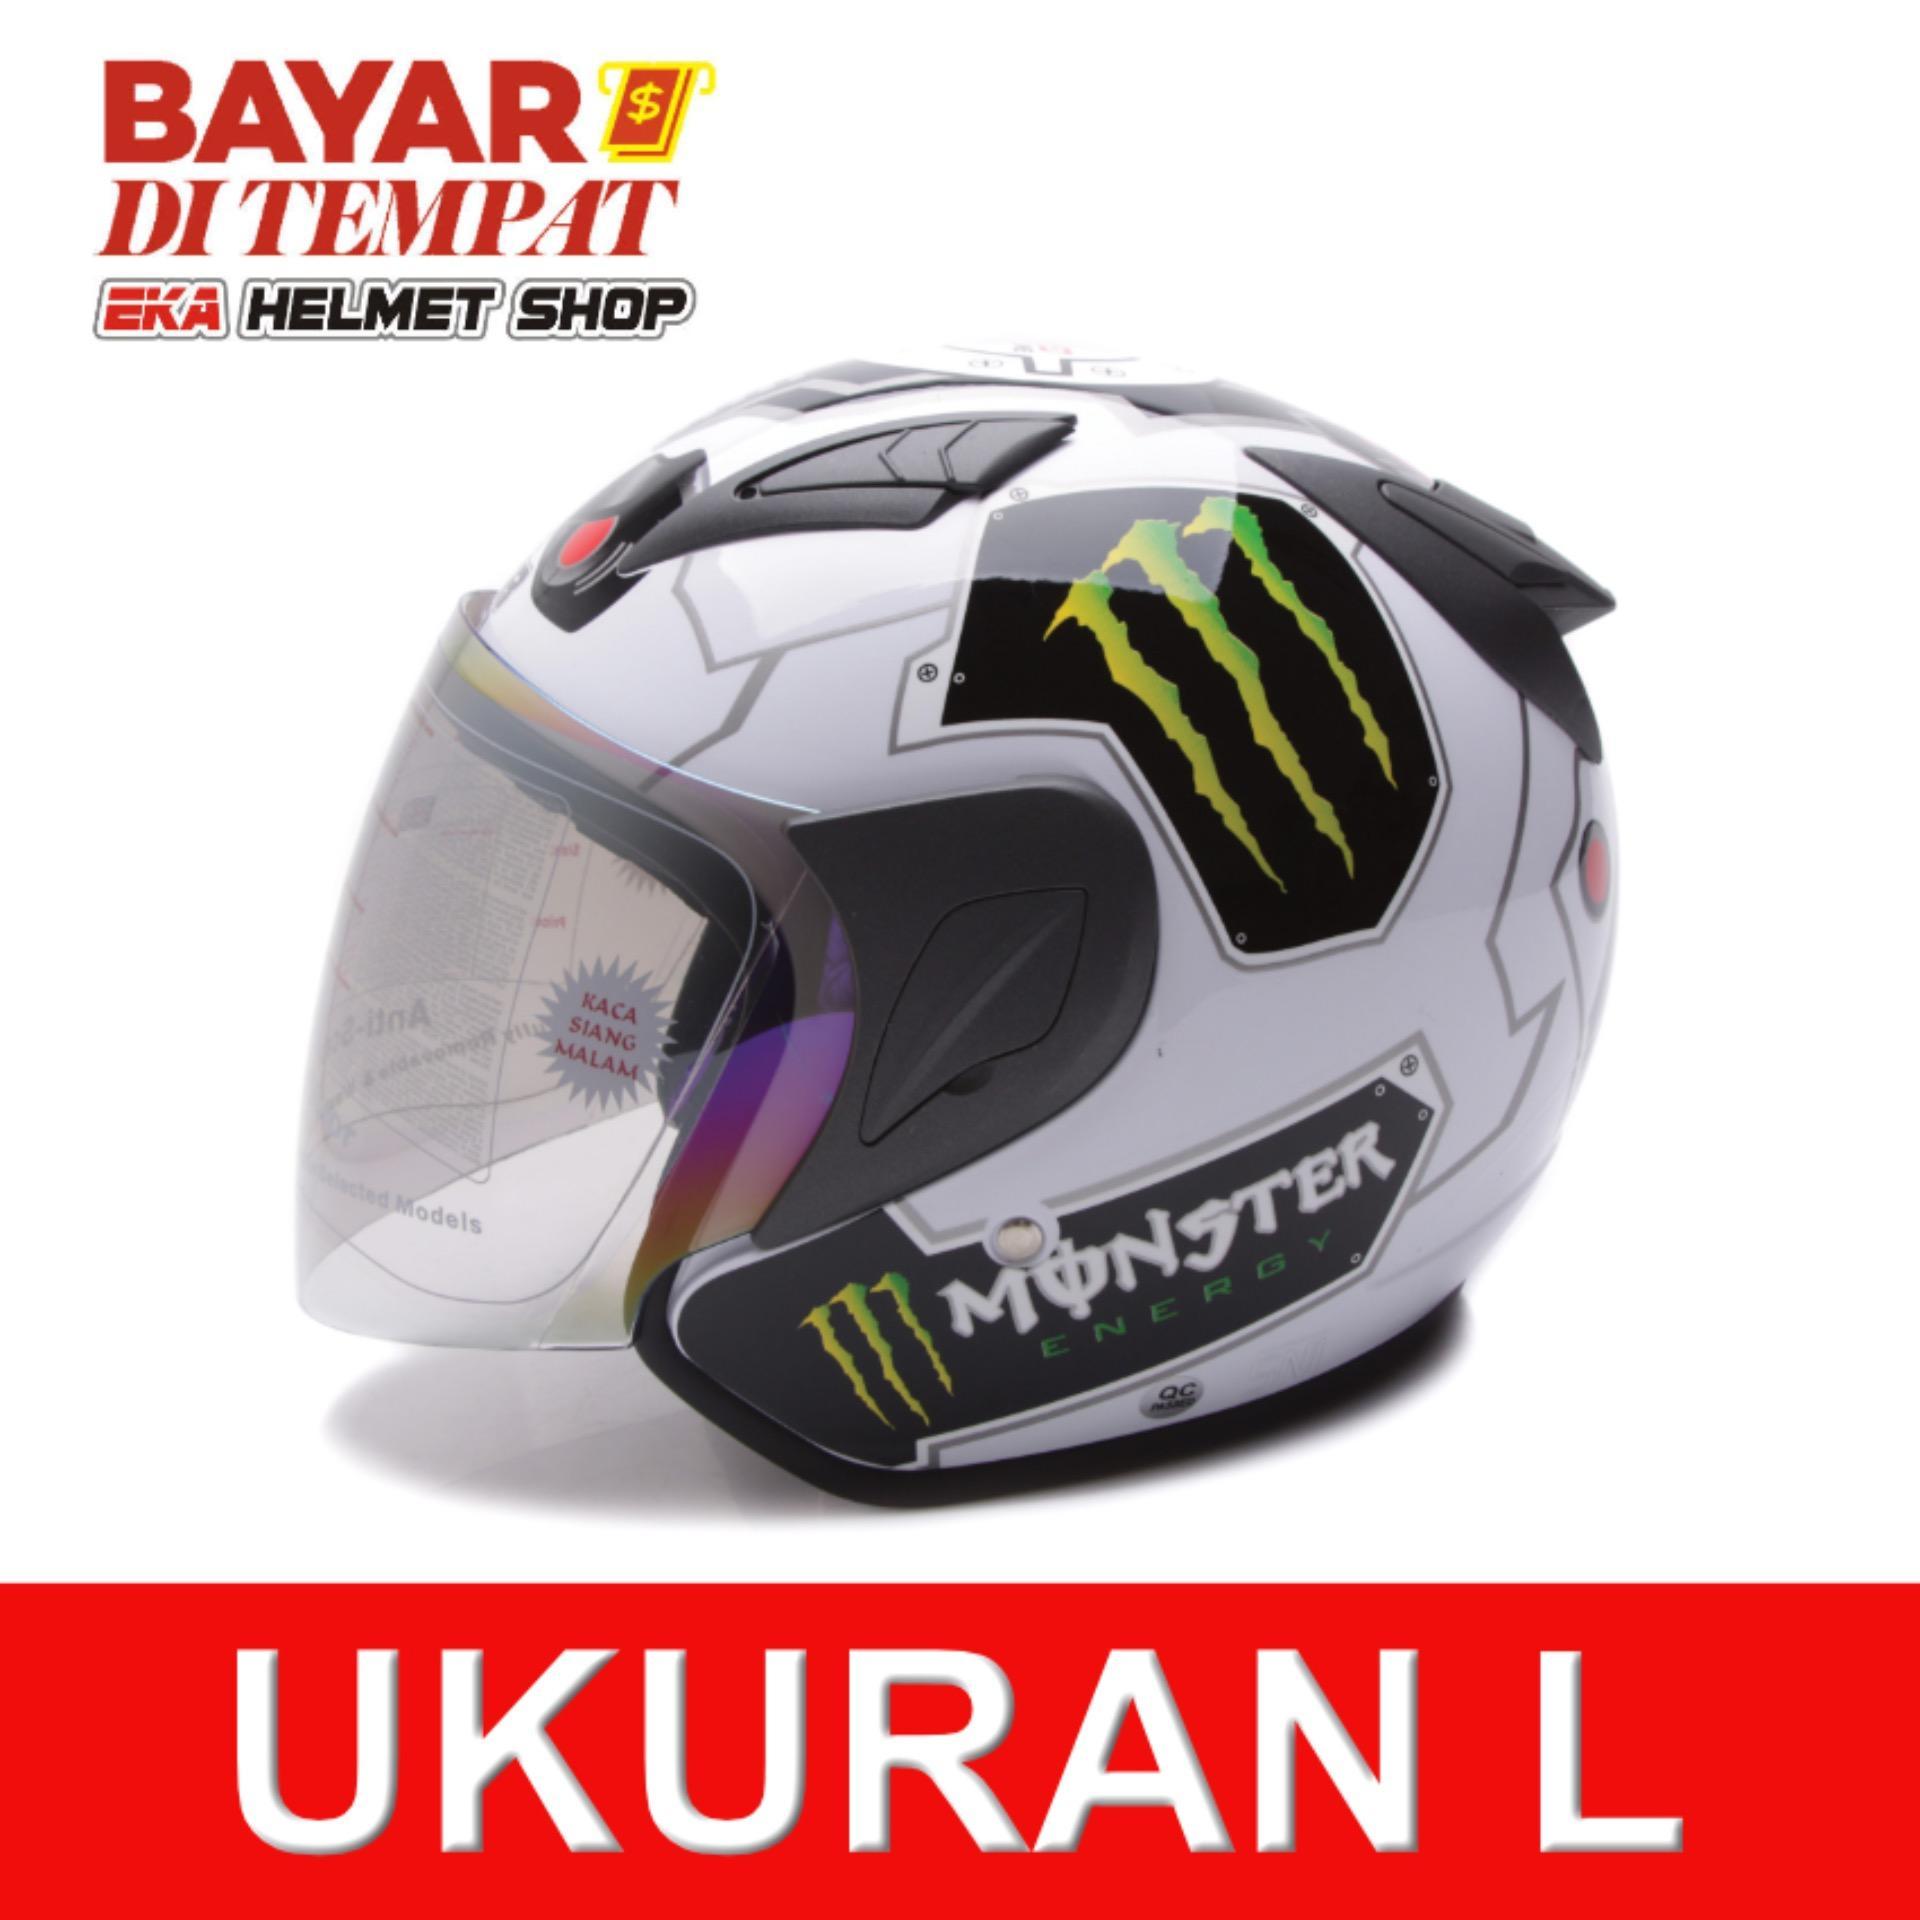 MSR Helmet Javelin - Monster - Putih